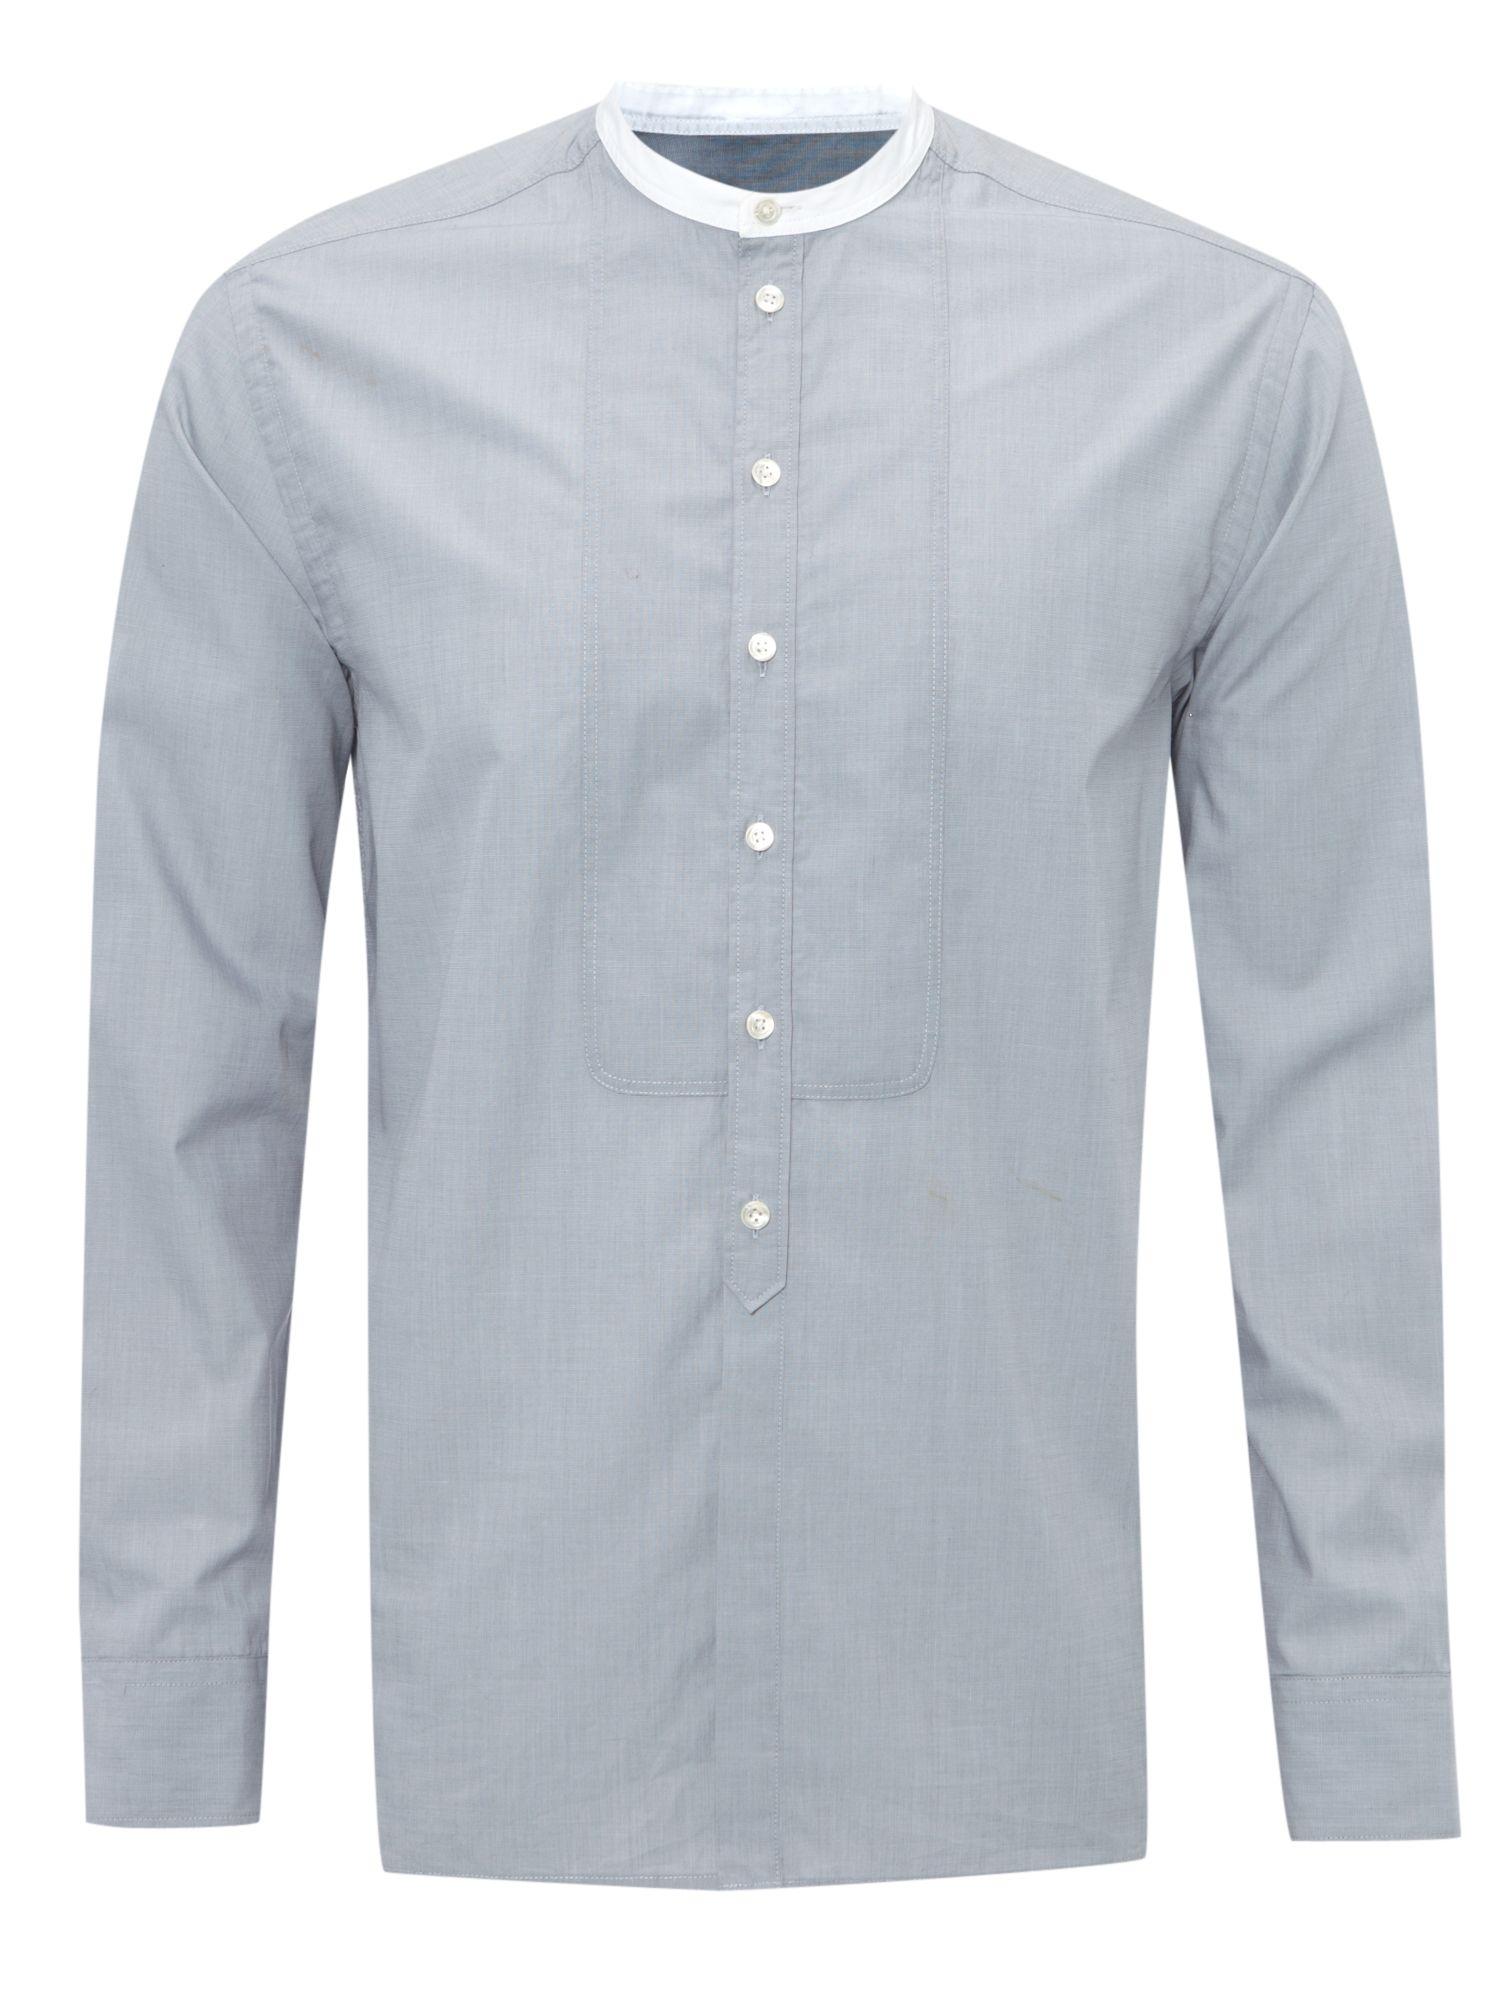 Lyst Farrell Grandad Collar Shirt In Blue For Men: mens grandad collar shirt